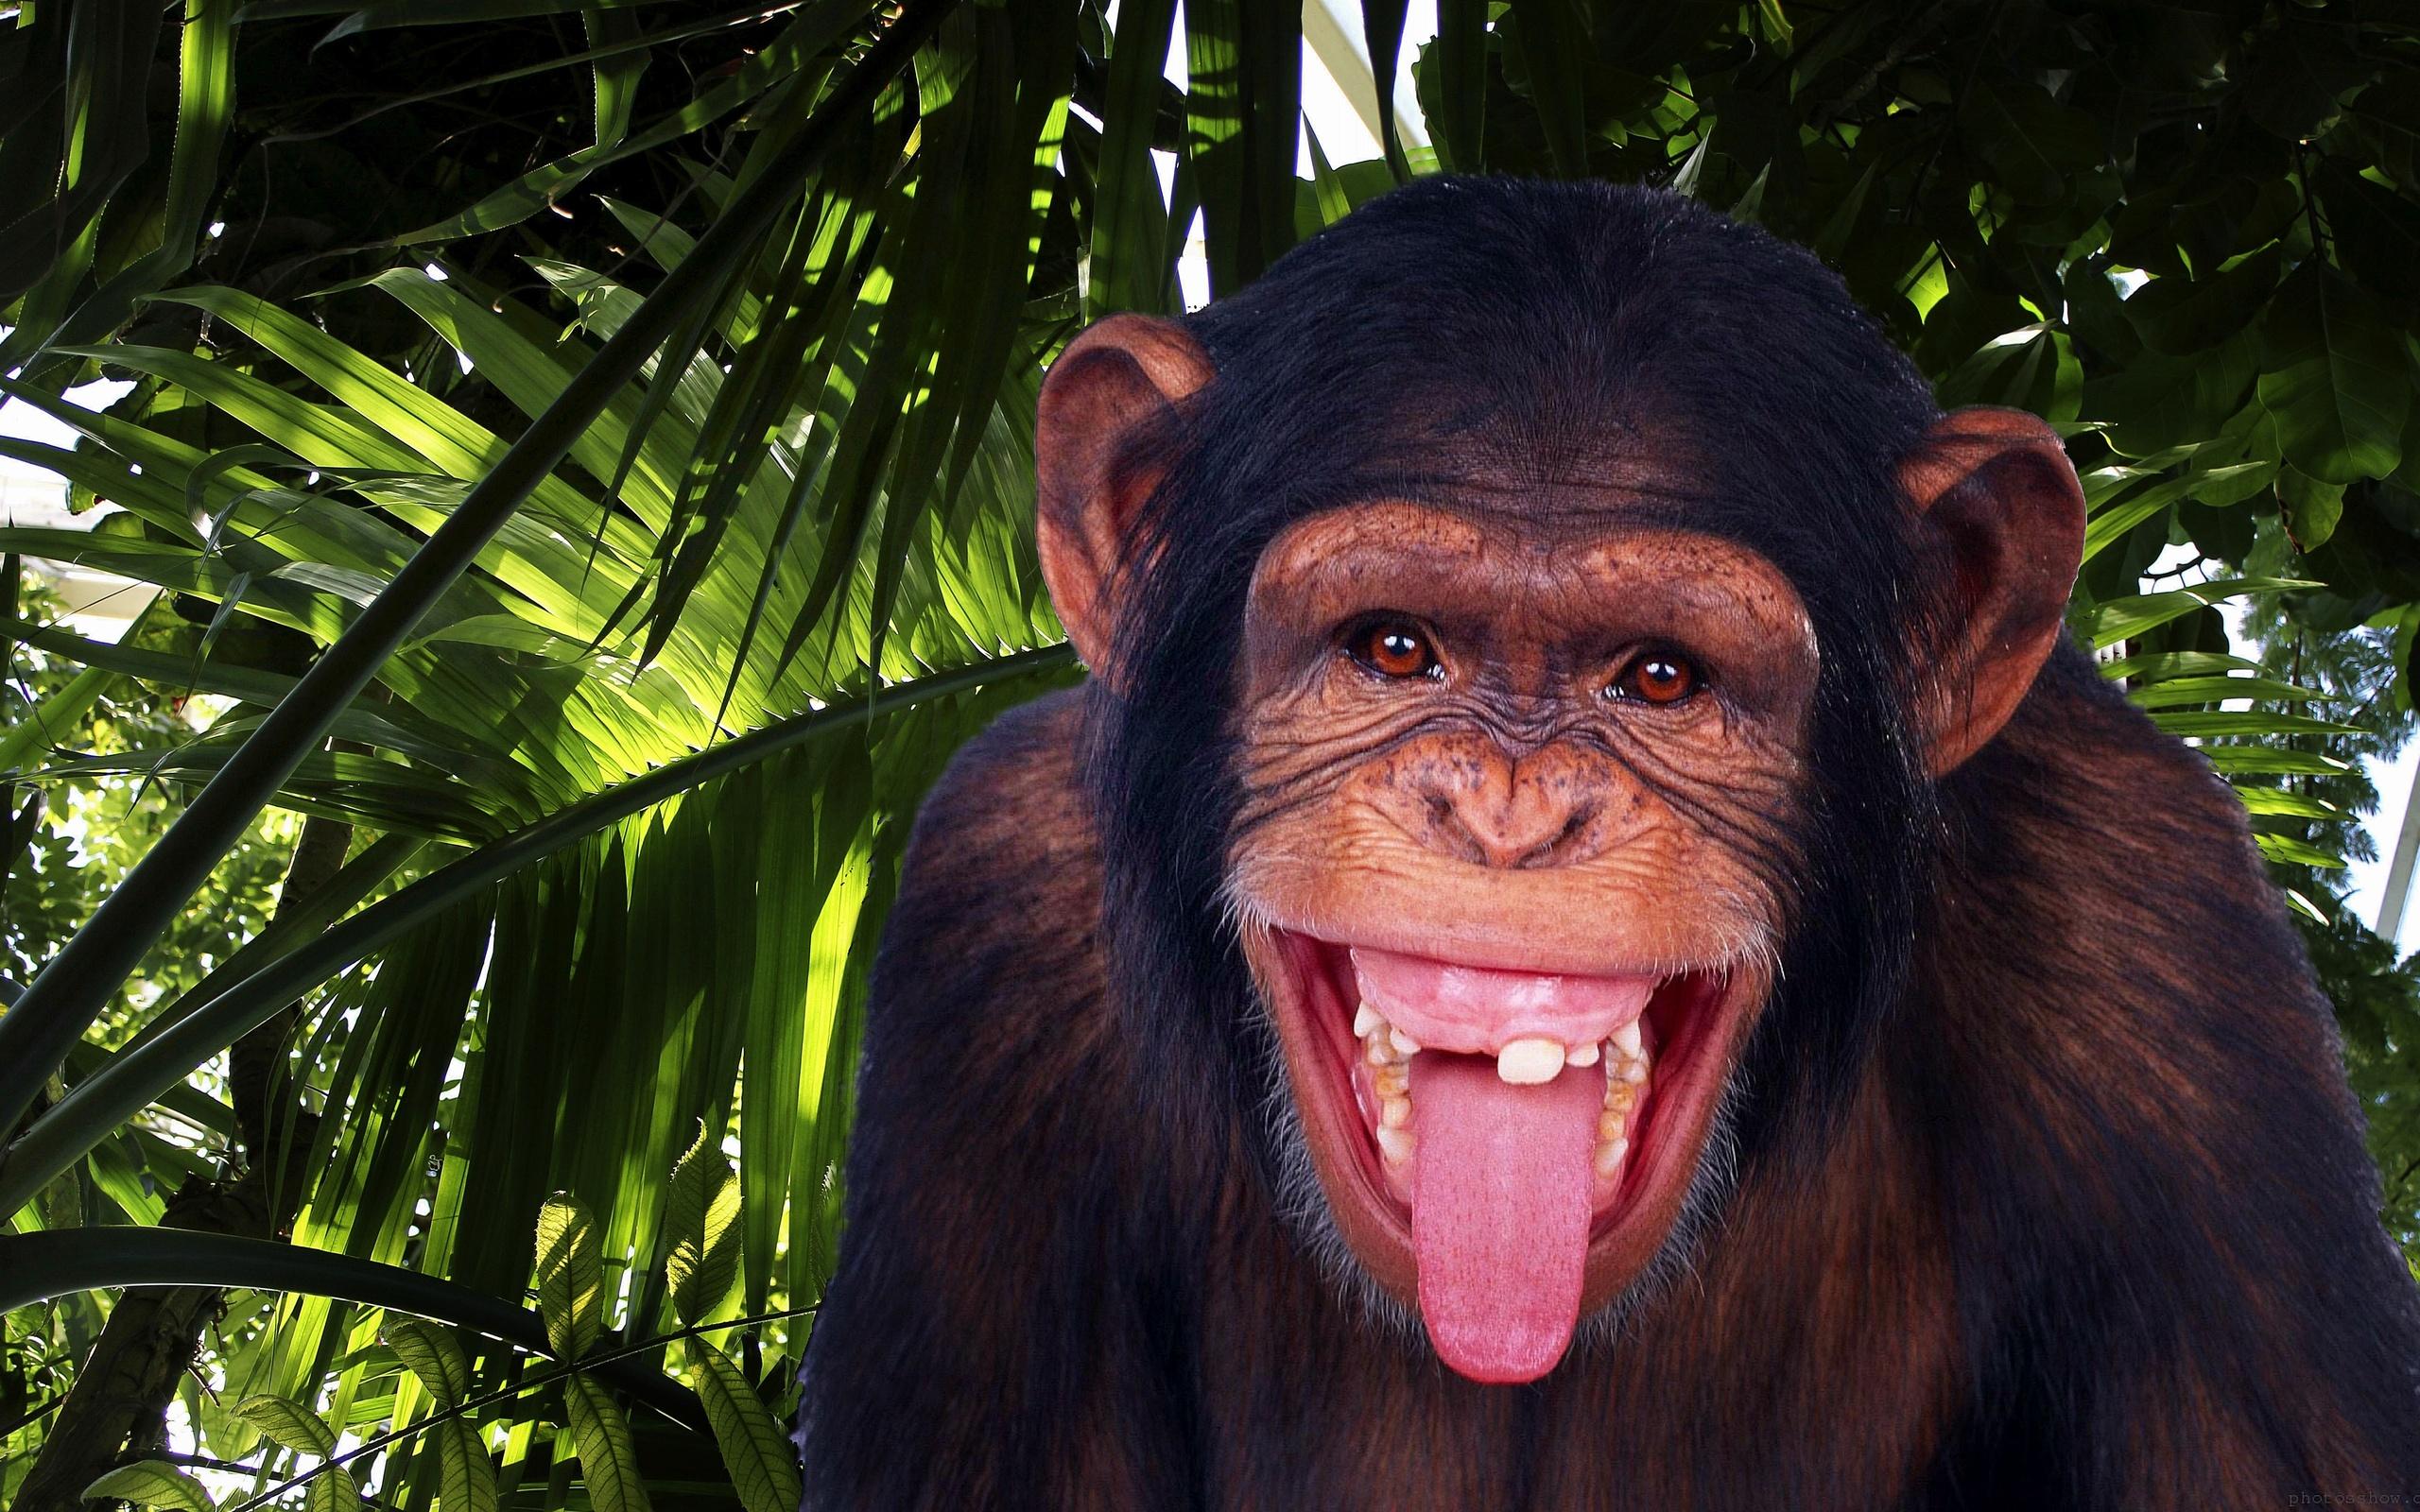 Chimpanzee-Kibale Forest National Park - gorilla tours